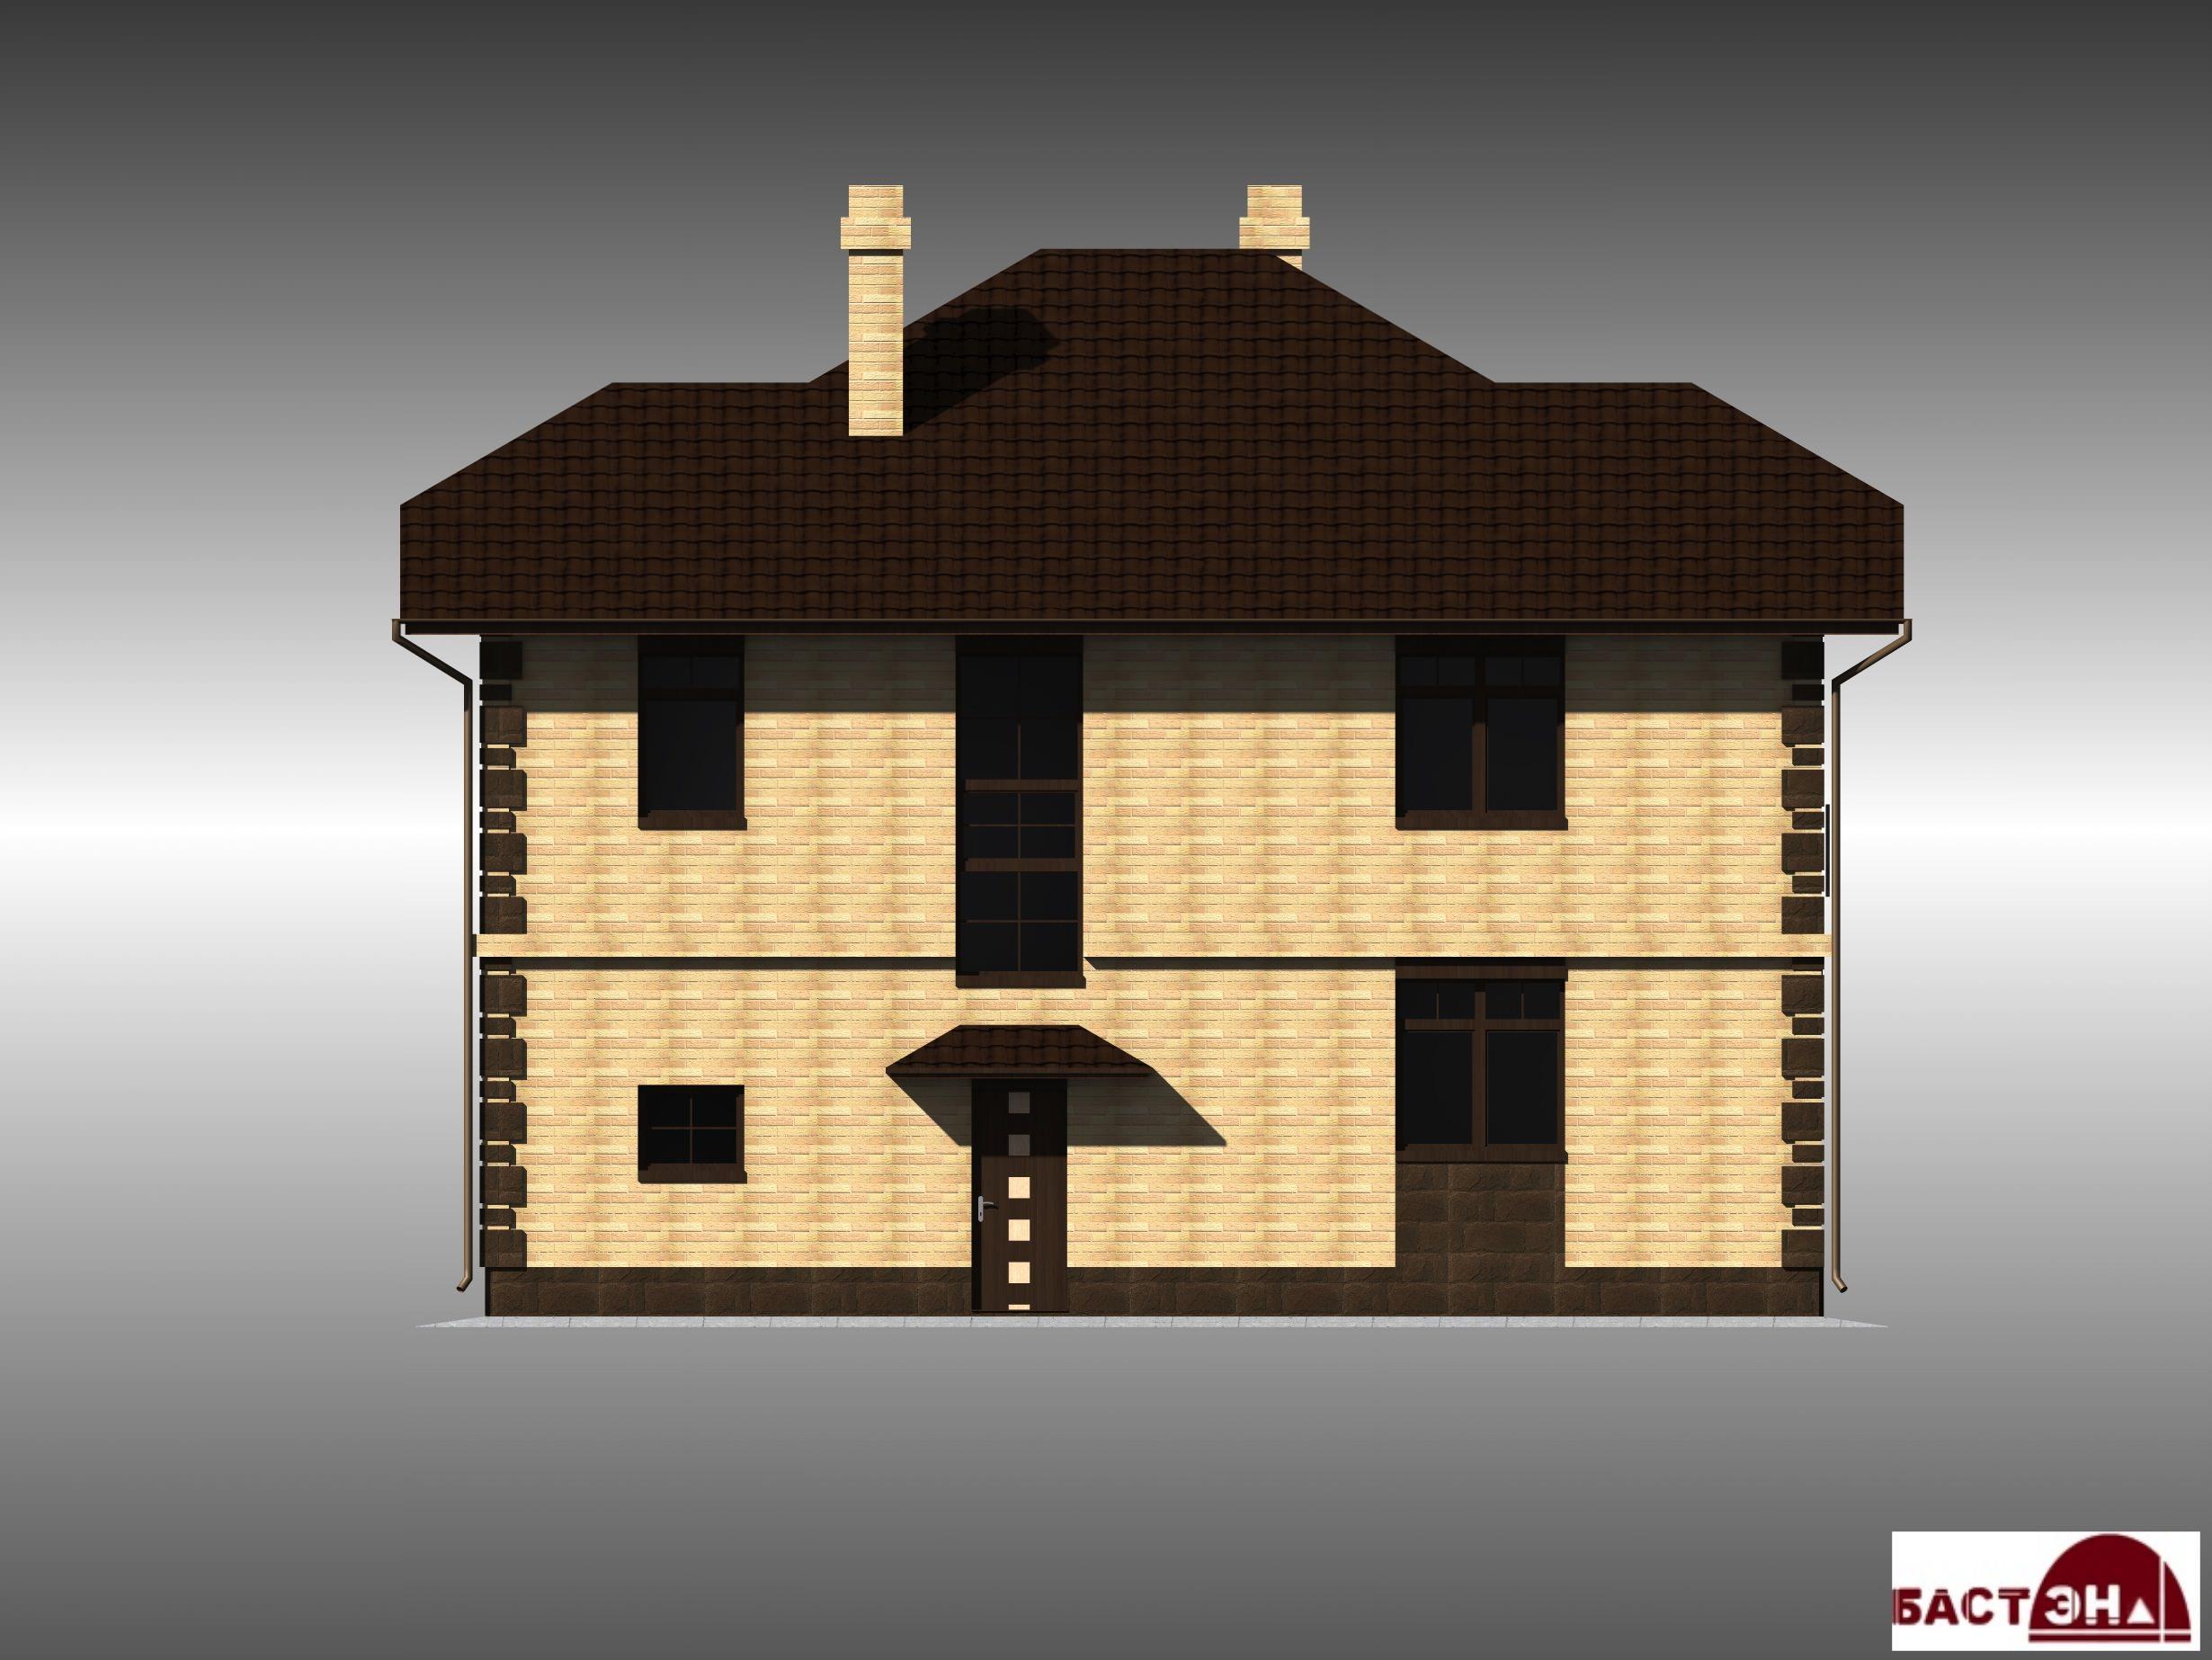 vid-1-individualnyj-dizajn-fasada-tipovogo-proekta-53-31.jpg